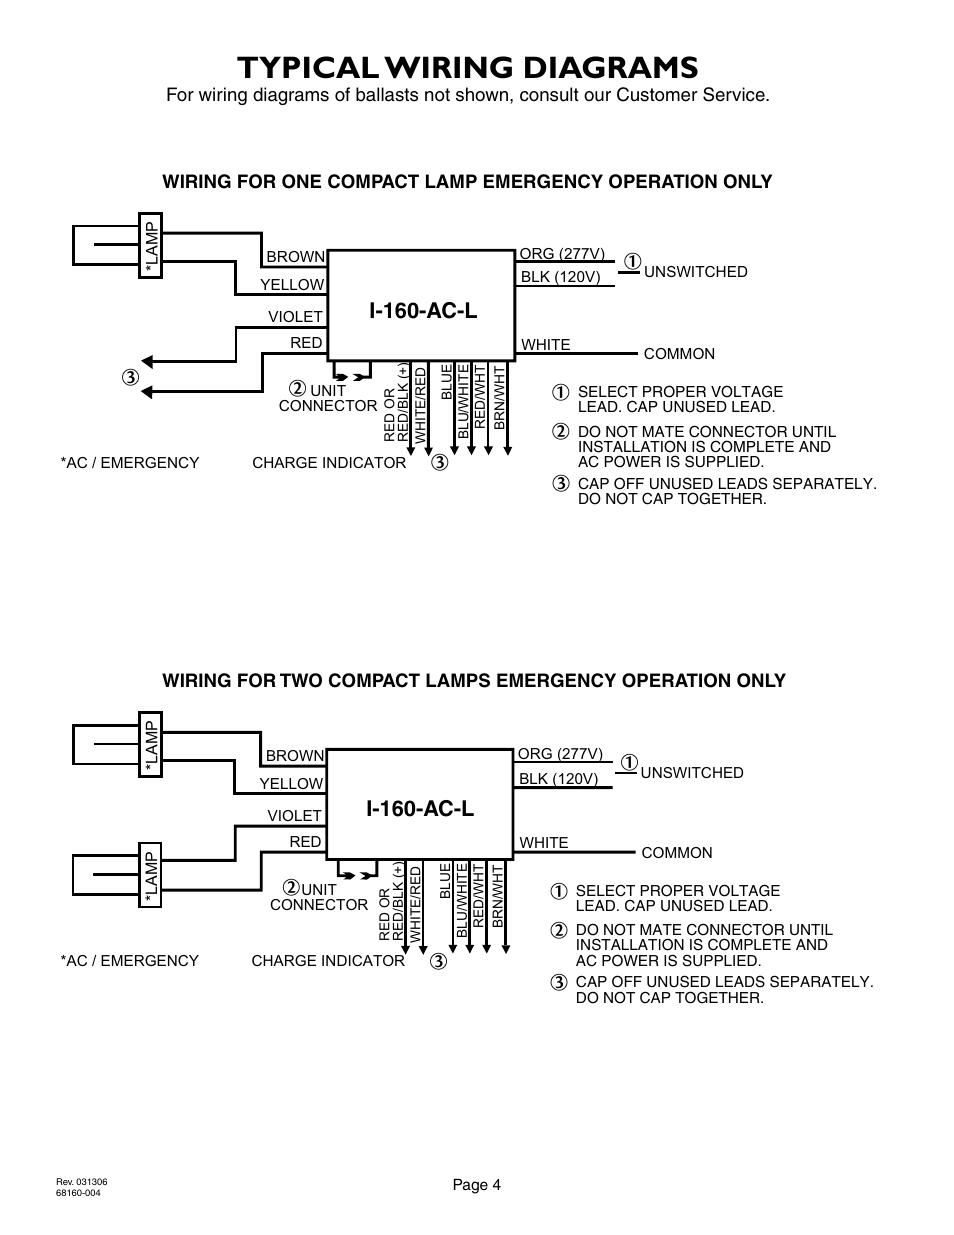 Perfect Iota Emergency Ballast Wiring Diagram Ensign Electrical